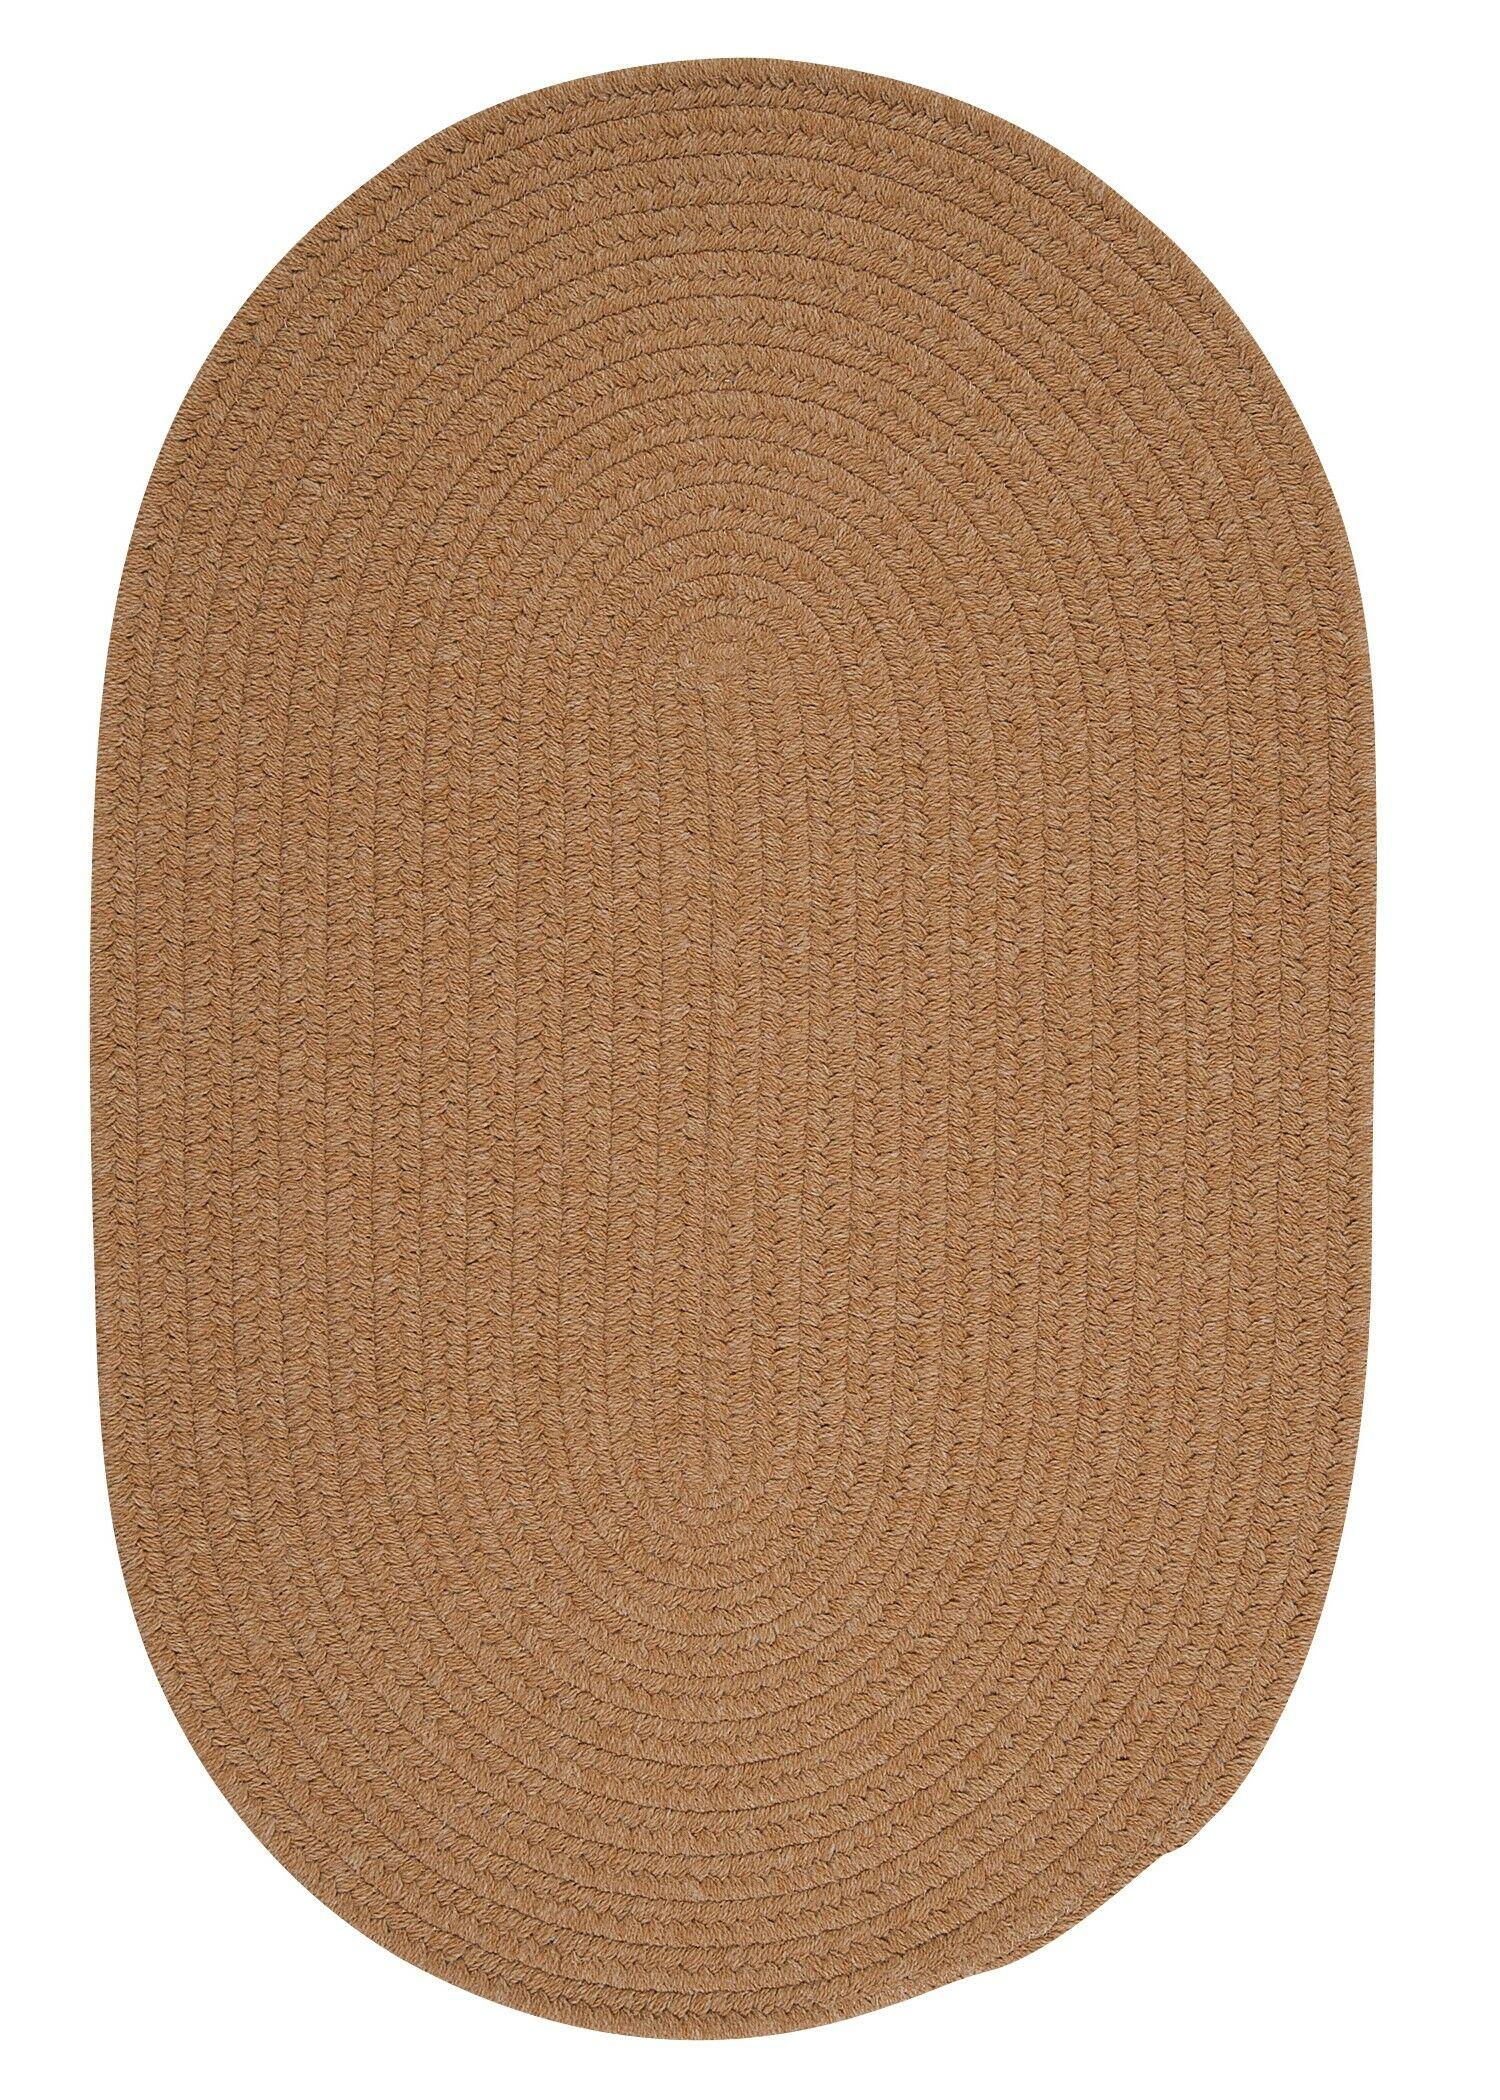 Navarrette Gold Area Rug Rug Size: Oval 10' x 13'